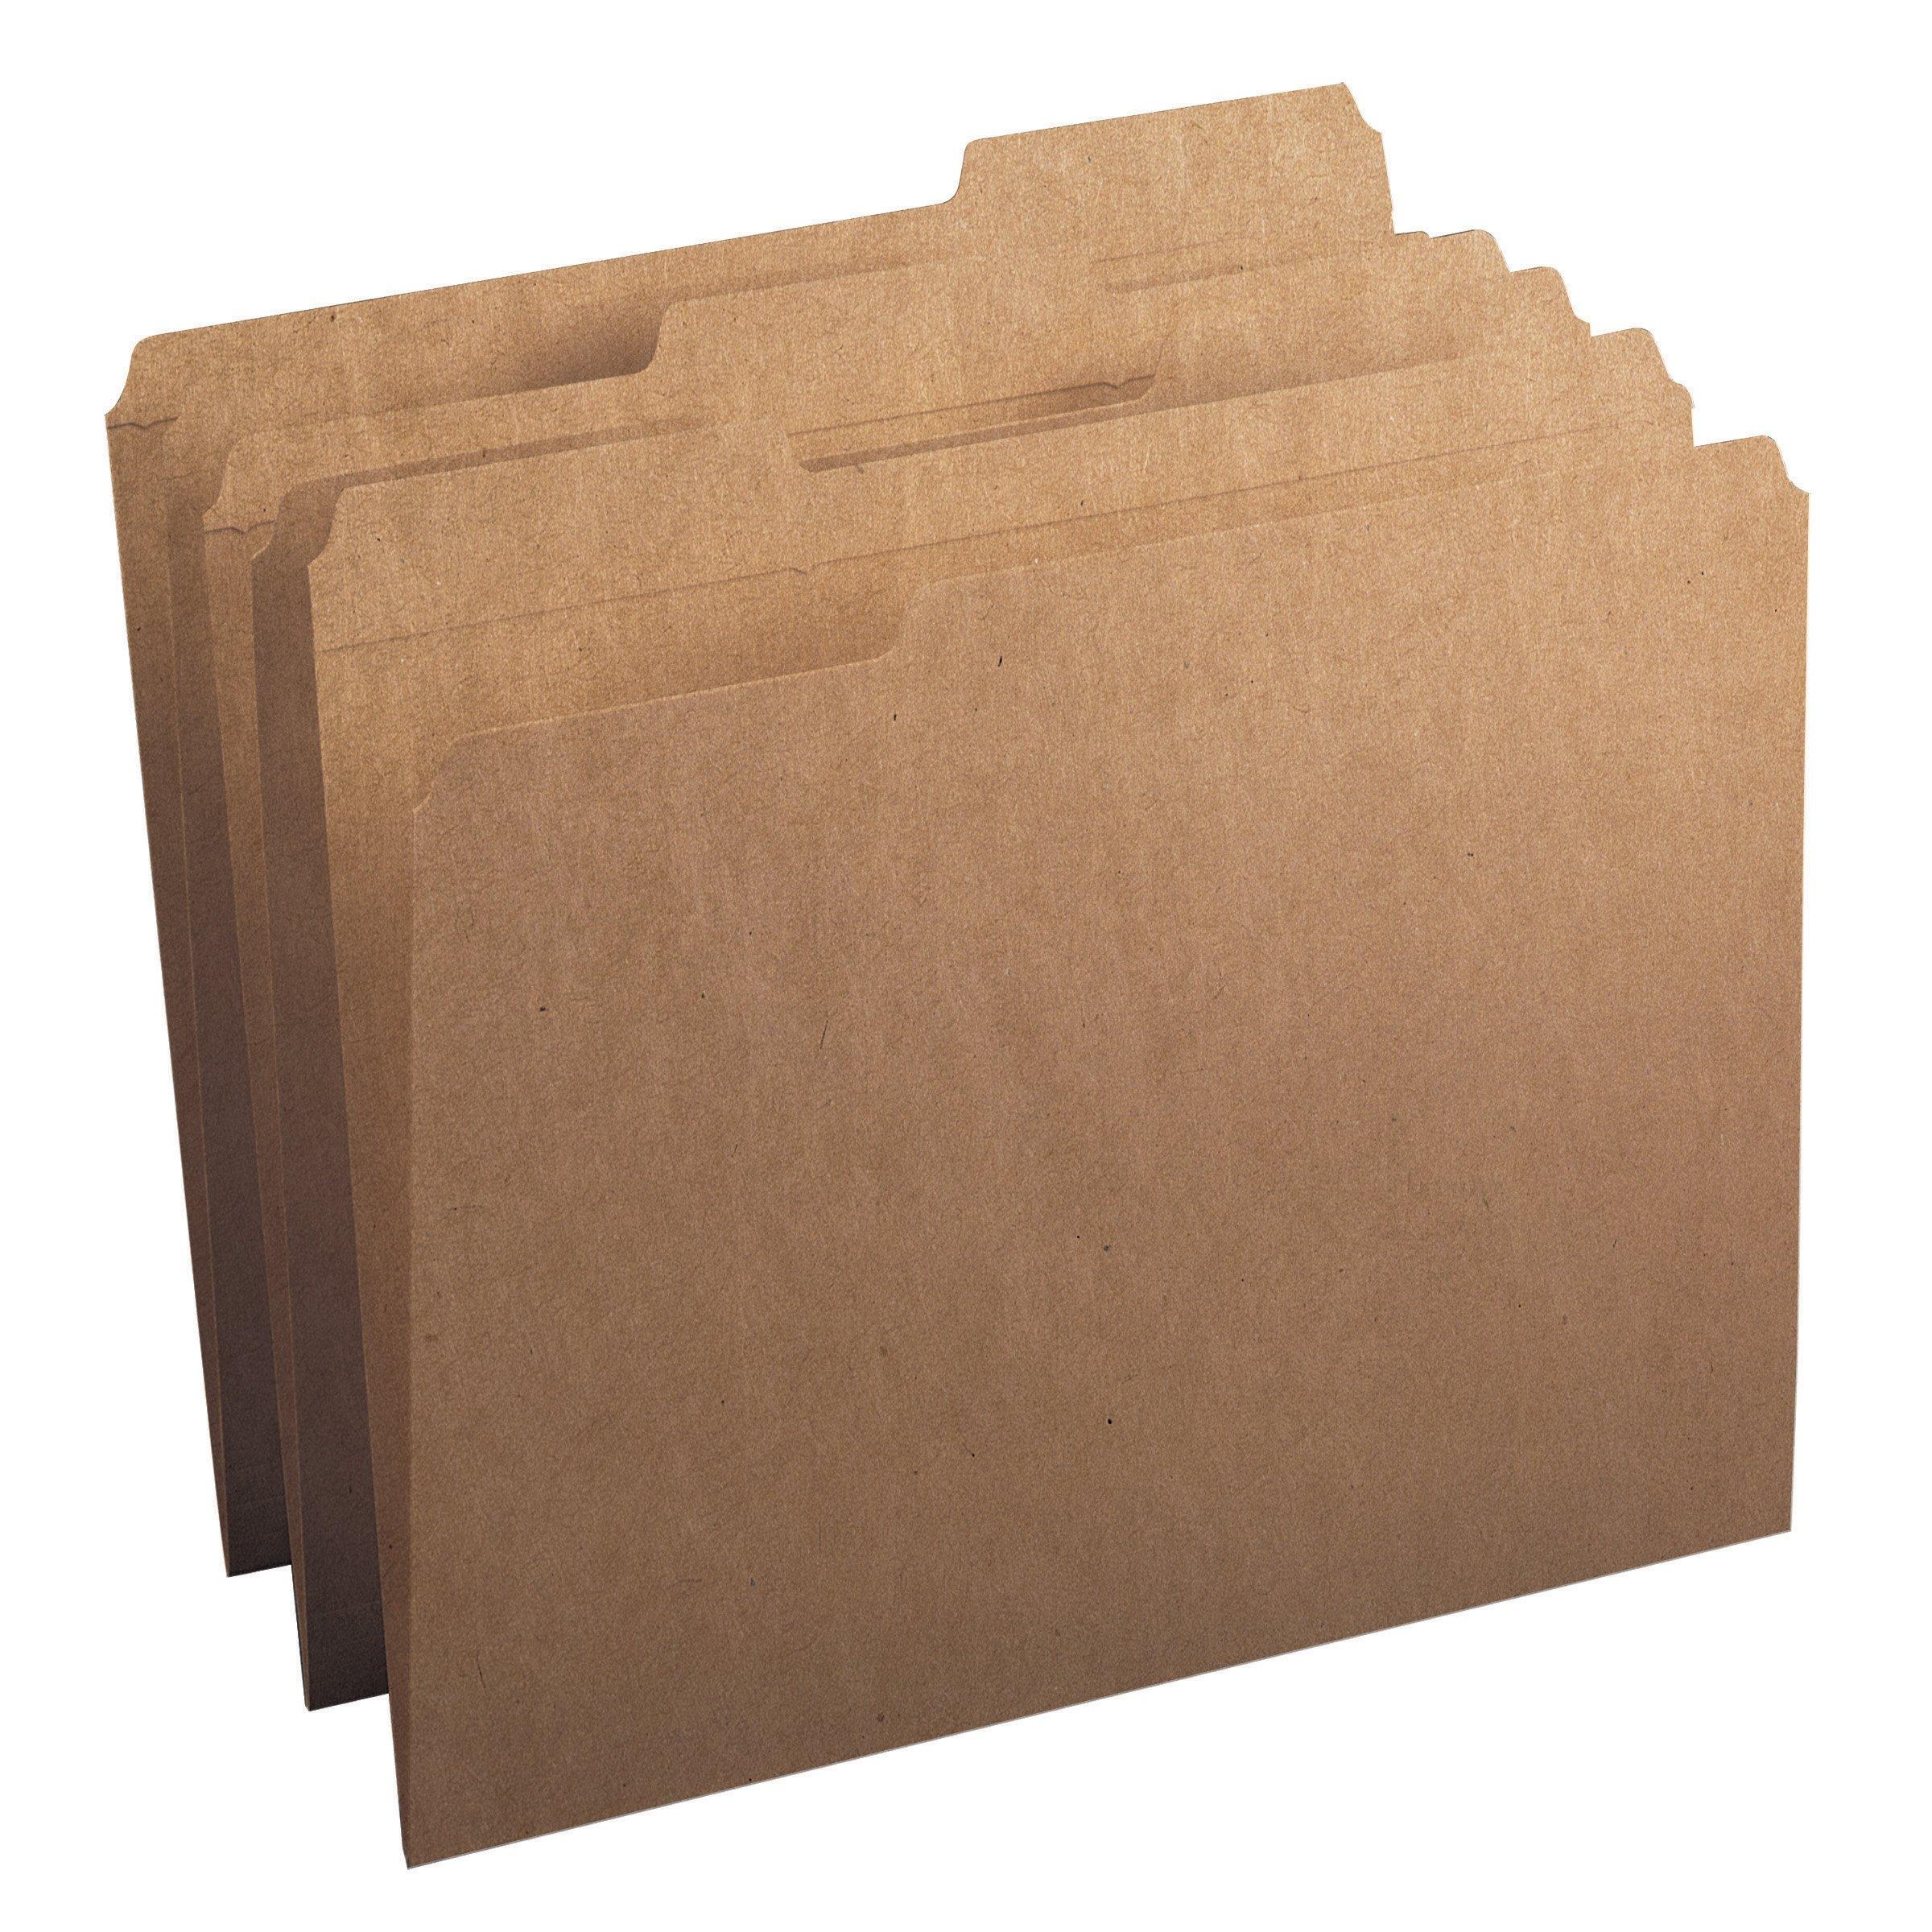 Smead File Folder, 1/3-Cut Tab, Letter Size, Kraft, 50 per Box (10830) by Smead